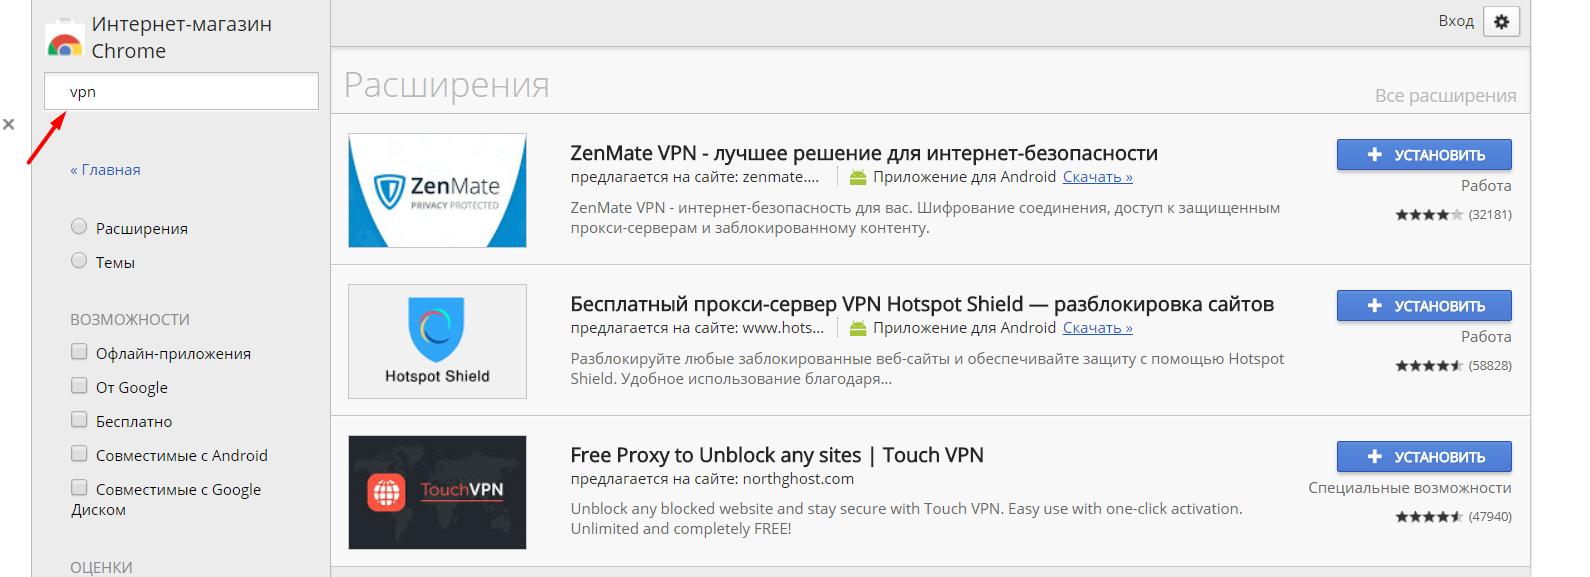 Hotspot shield windows 7 32bit download